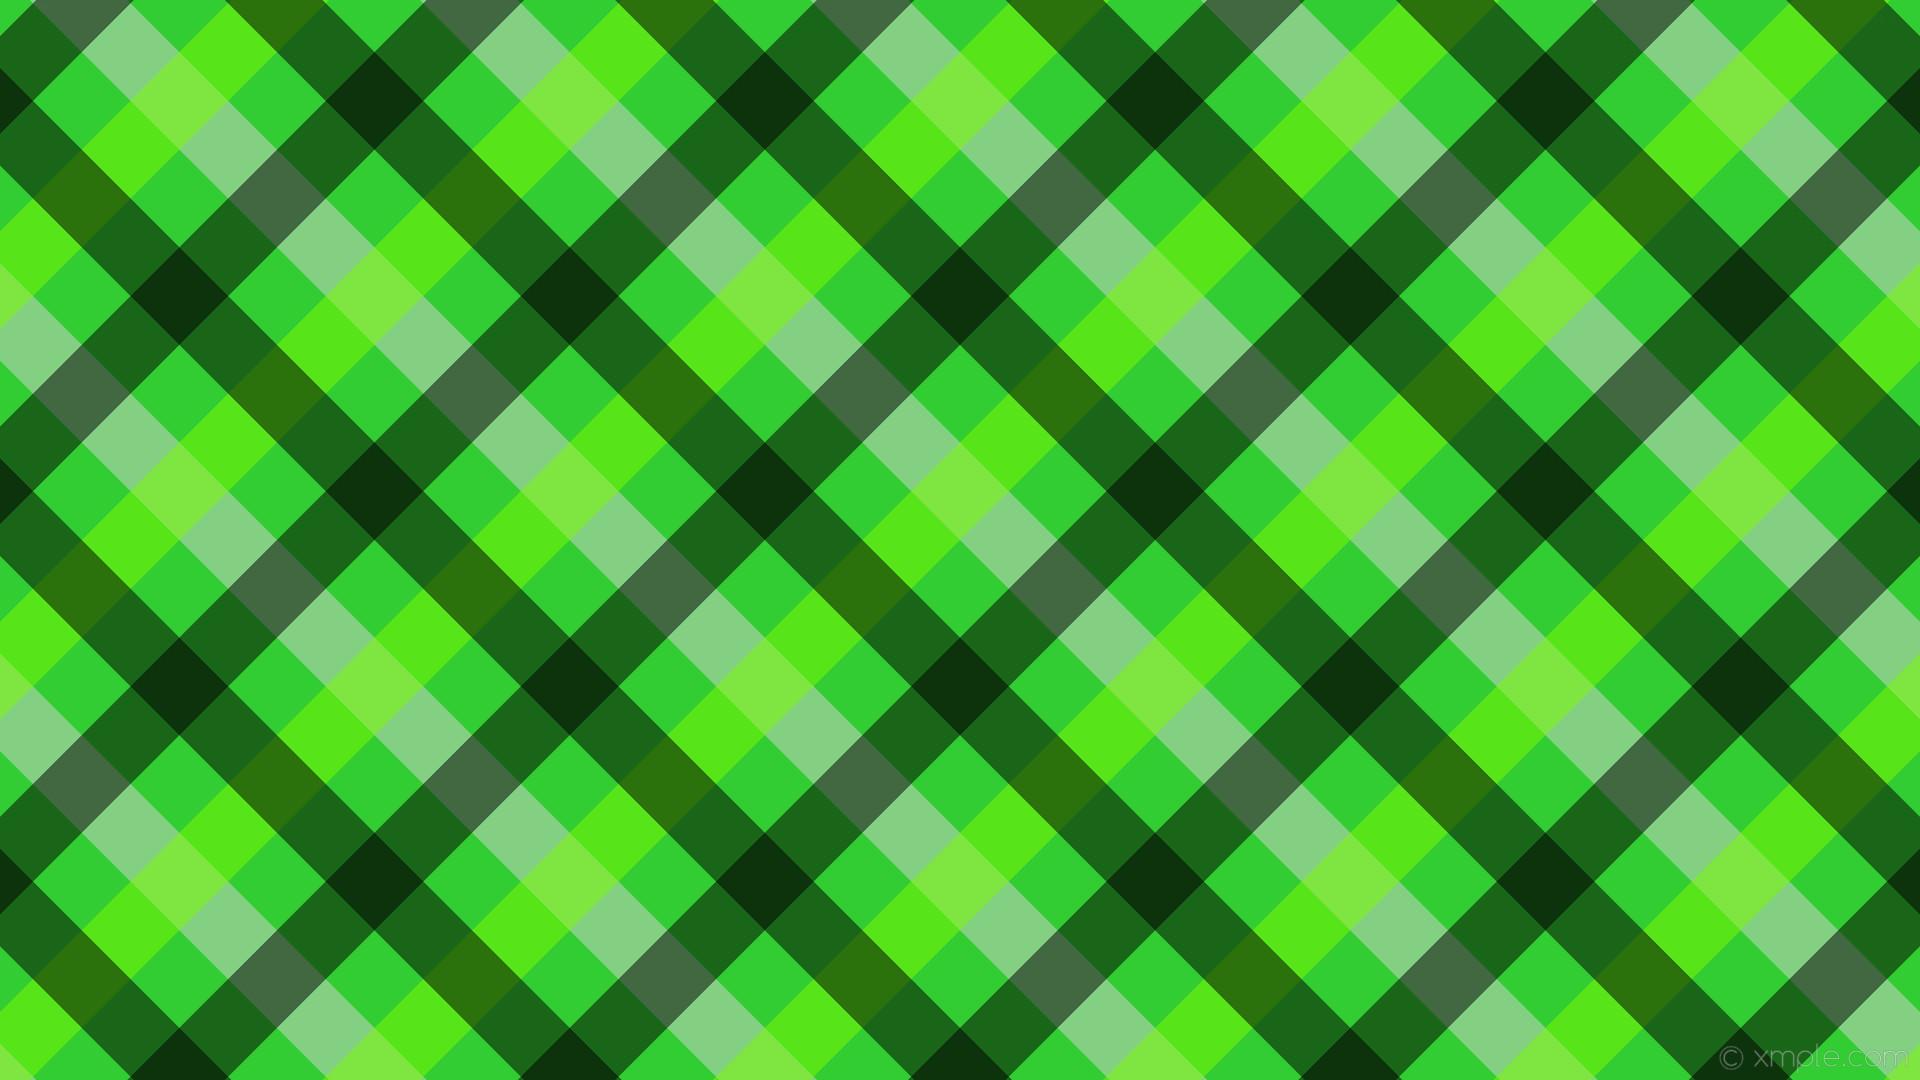 wallpaper black striped quad green gingham grey lime green light gray lawn  green #32cd32 #